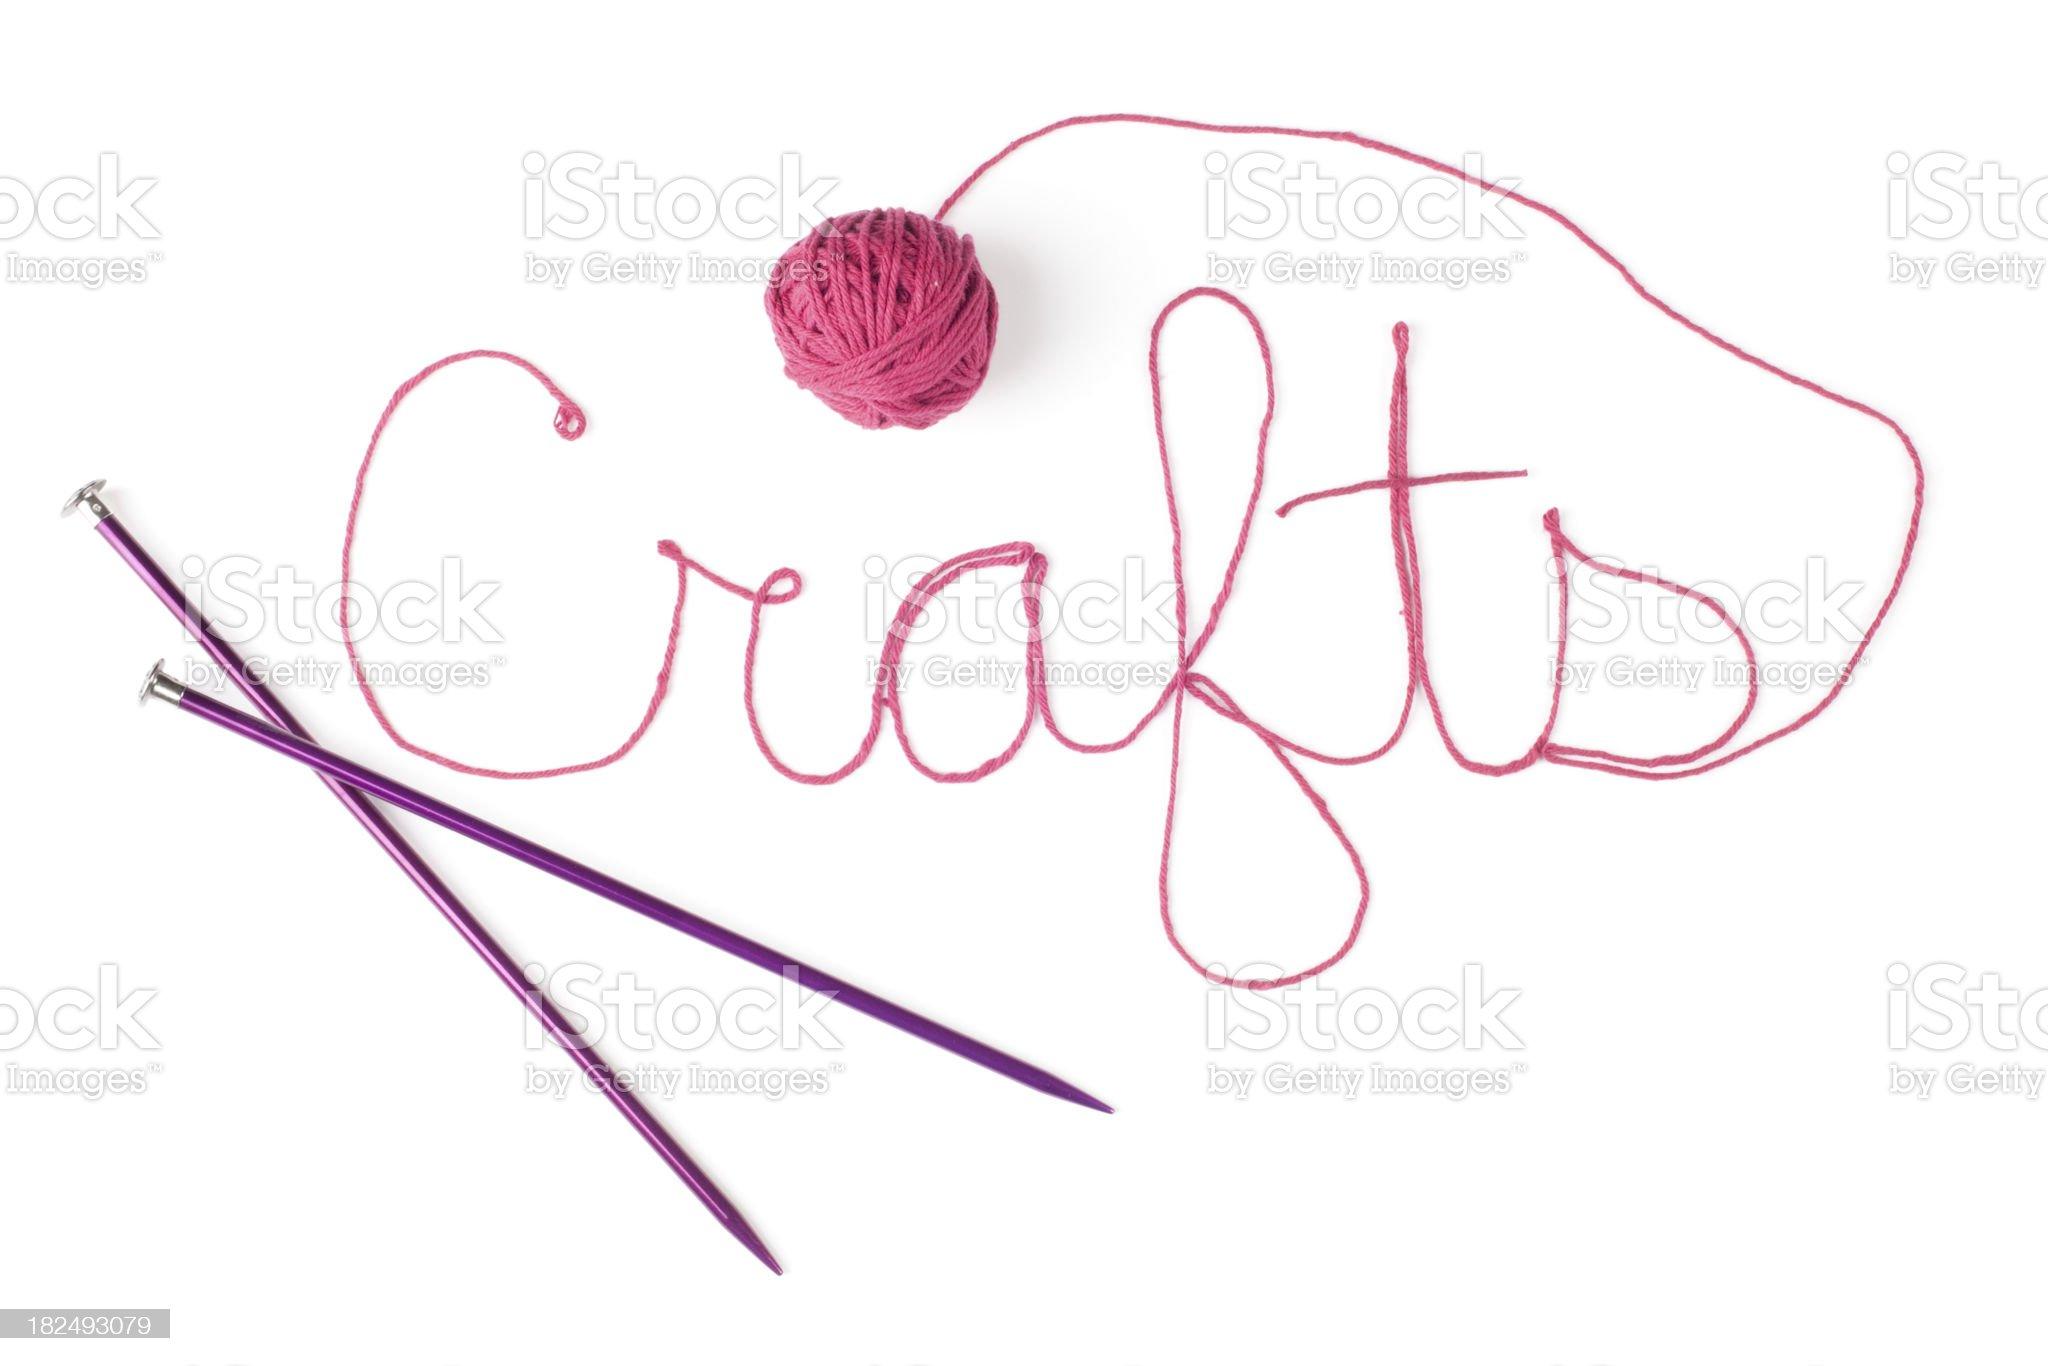 Crafts Yarn Word royalty-free stock photo